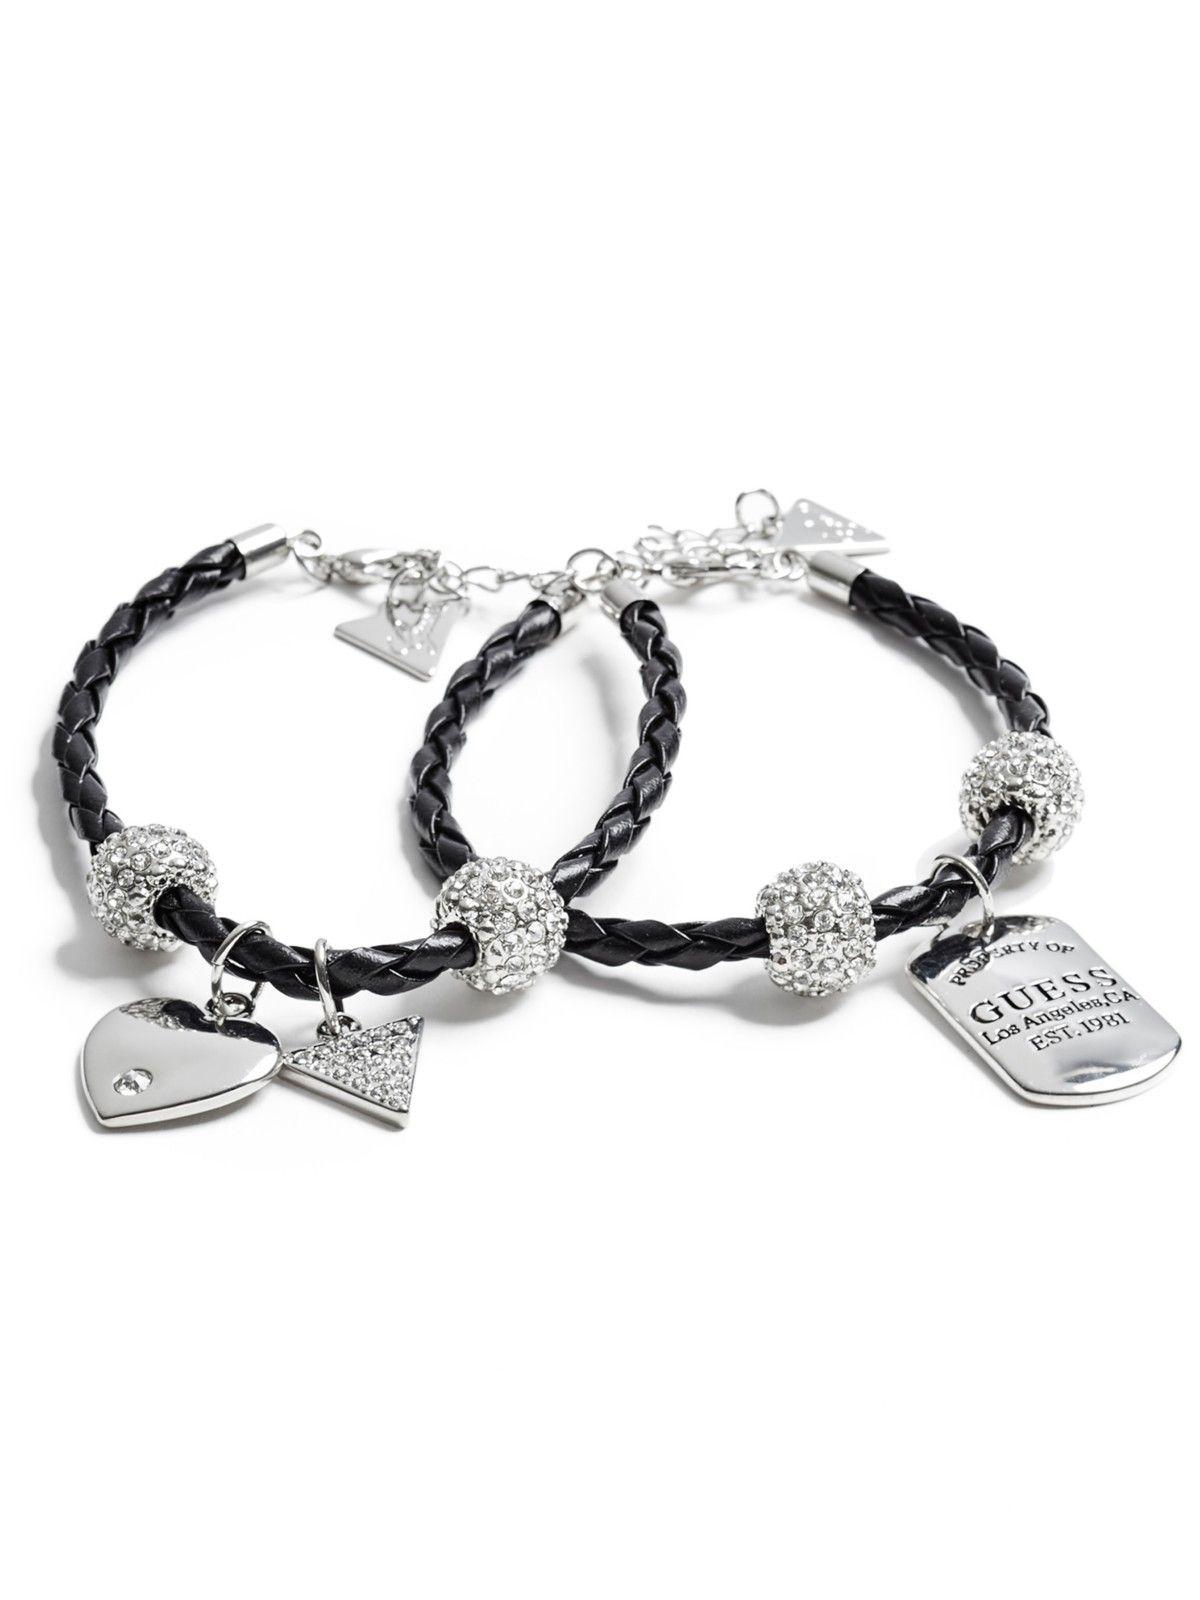 Silver-Tone Leather Bracelet Set